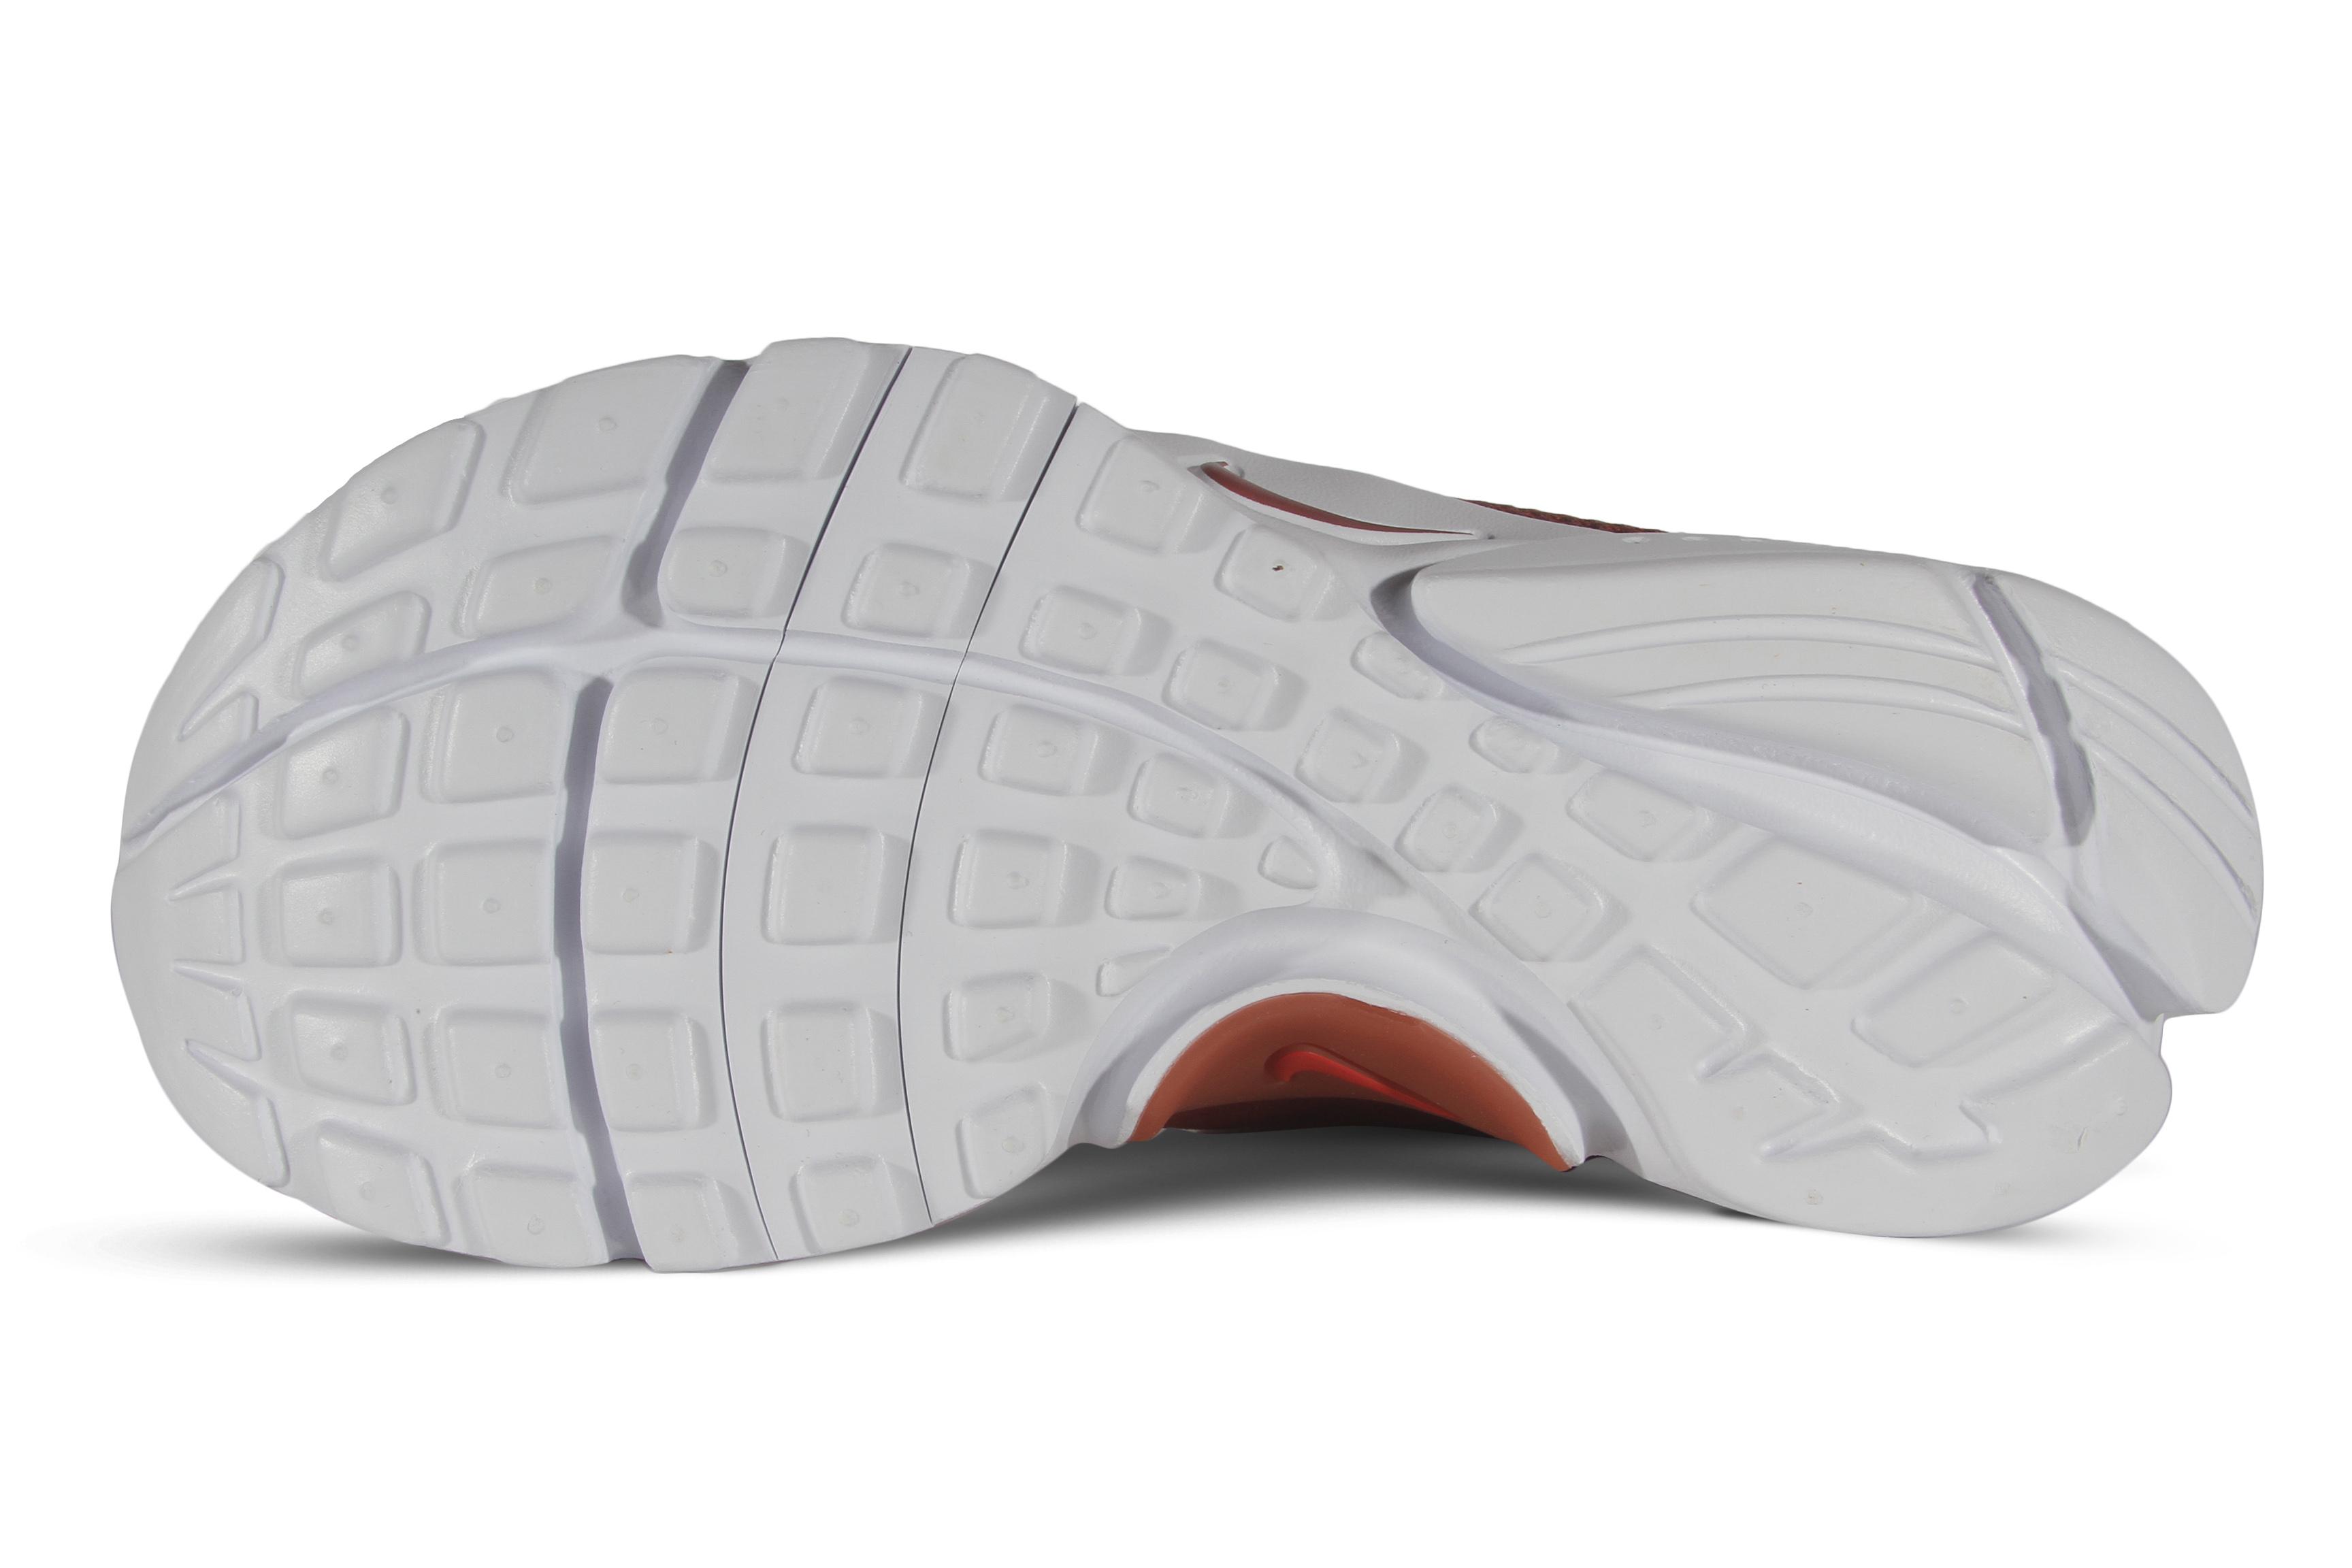 25e915495d1b Nike Presto Extreme (PS) Boy s Pre-School (Little Kids) Running Shoes  870023-604